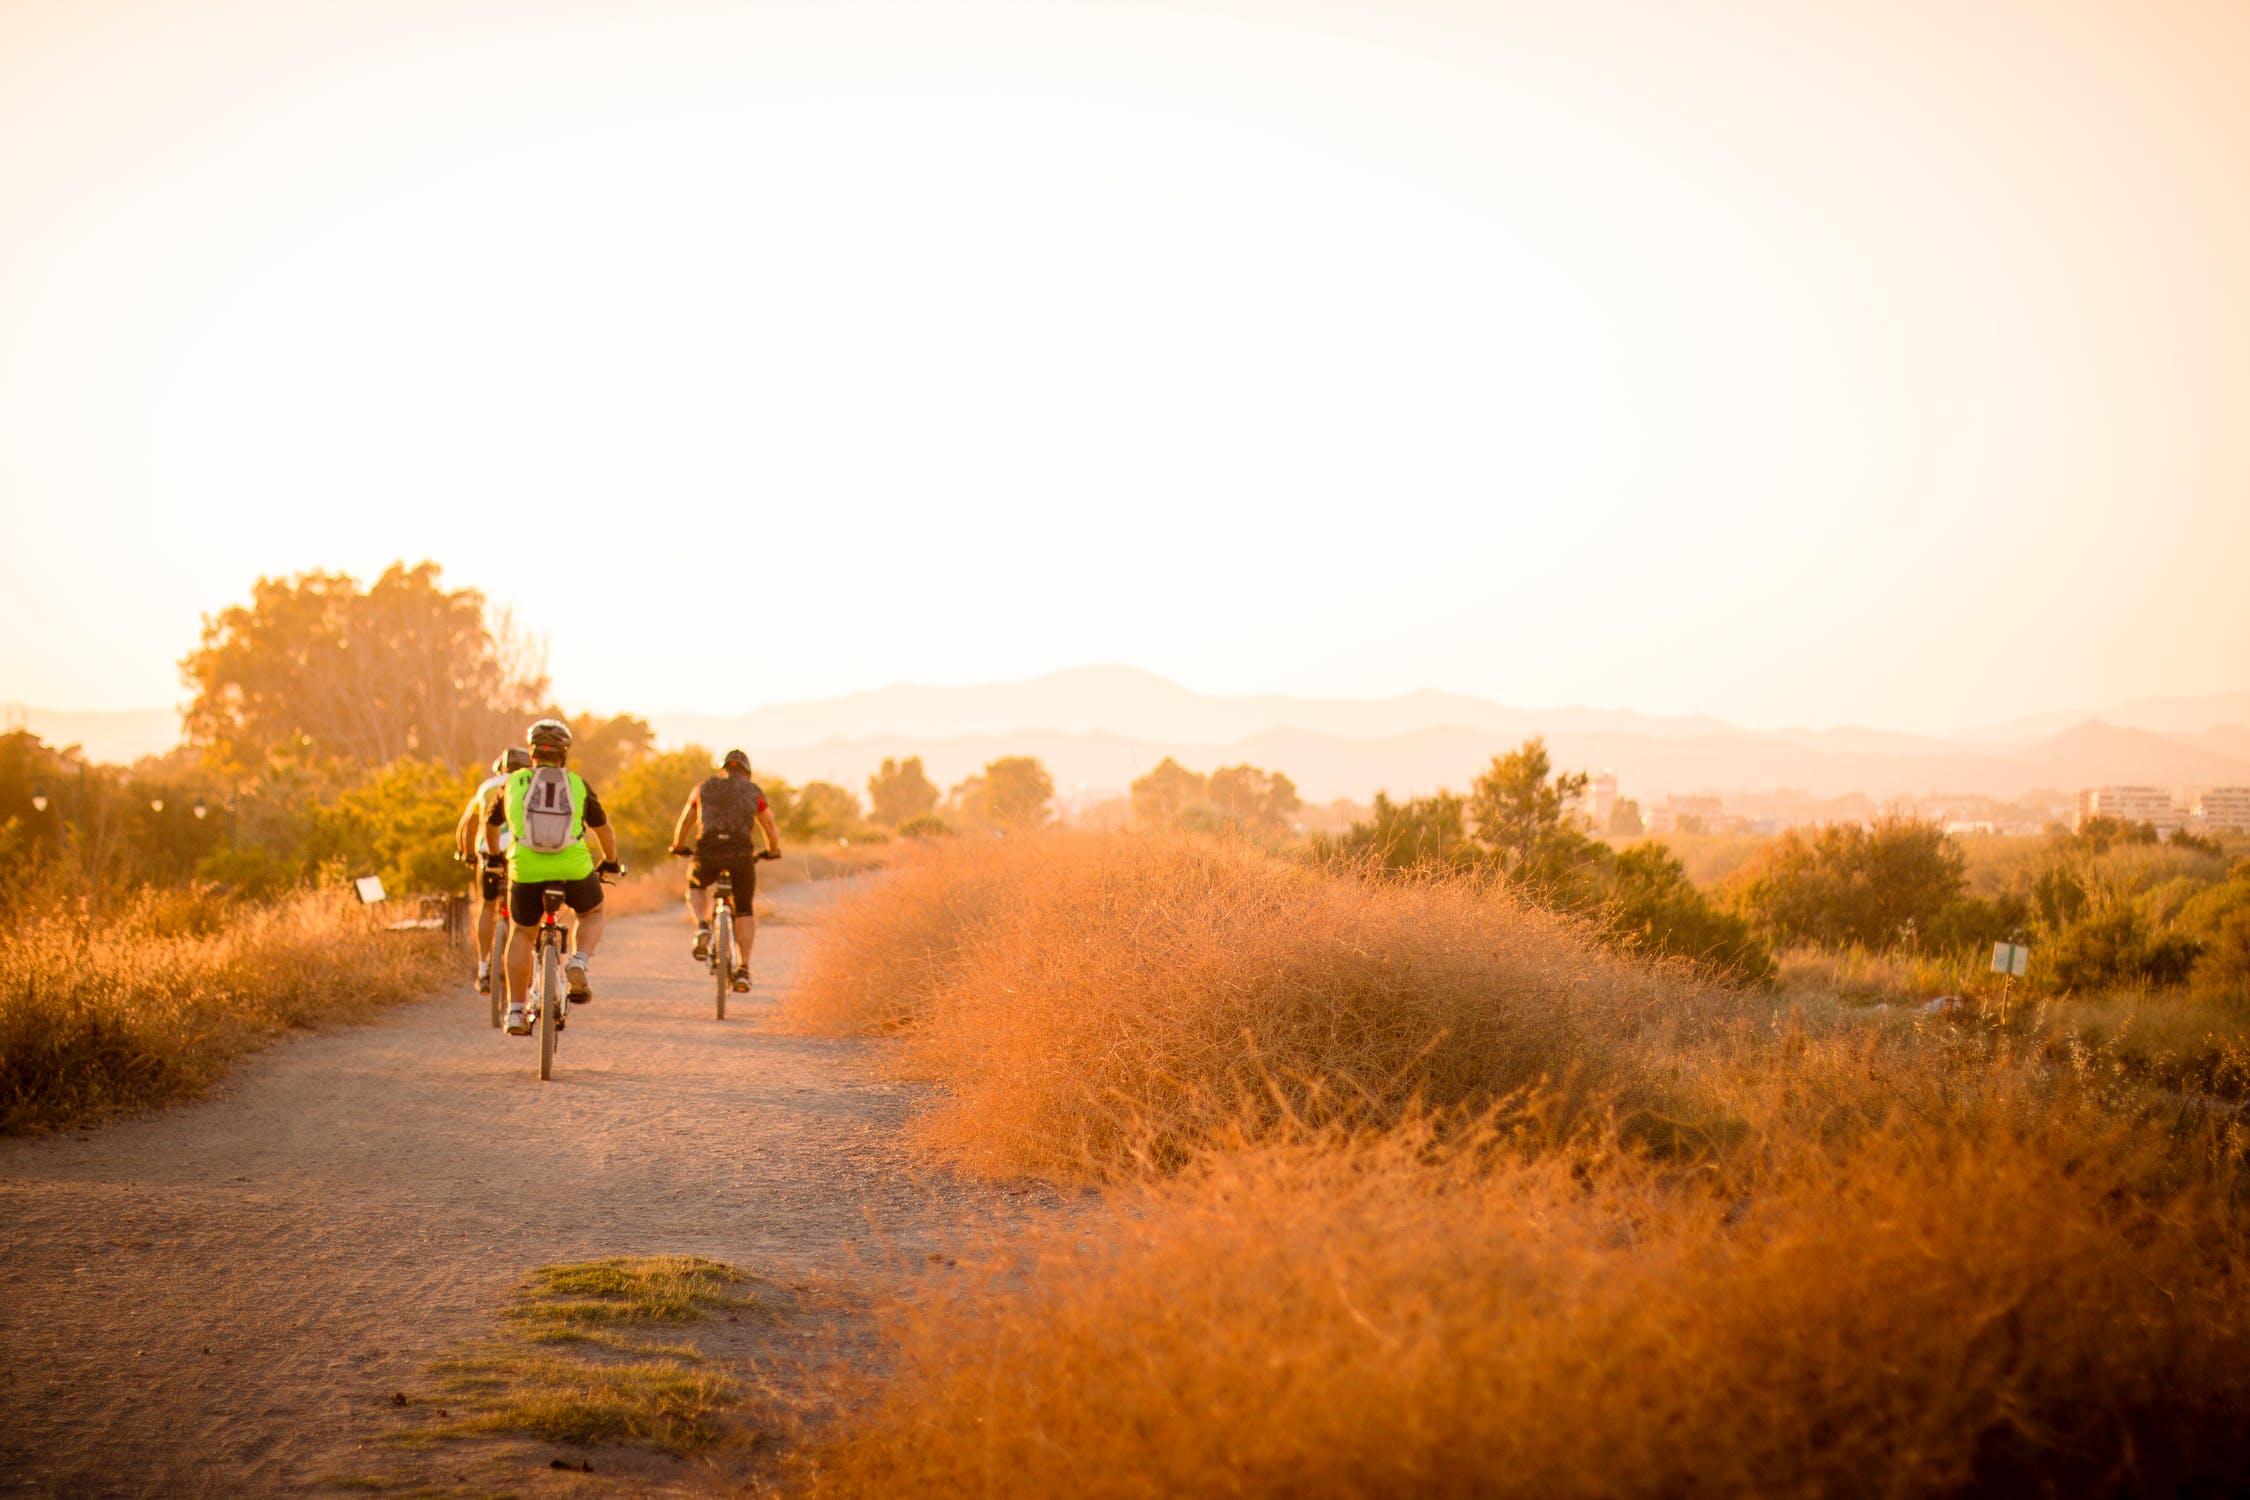 exercise cycle bike movement outside sunny